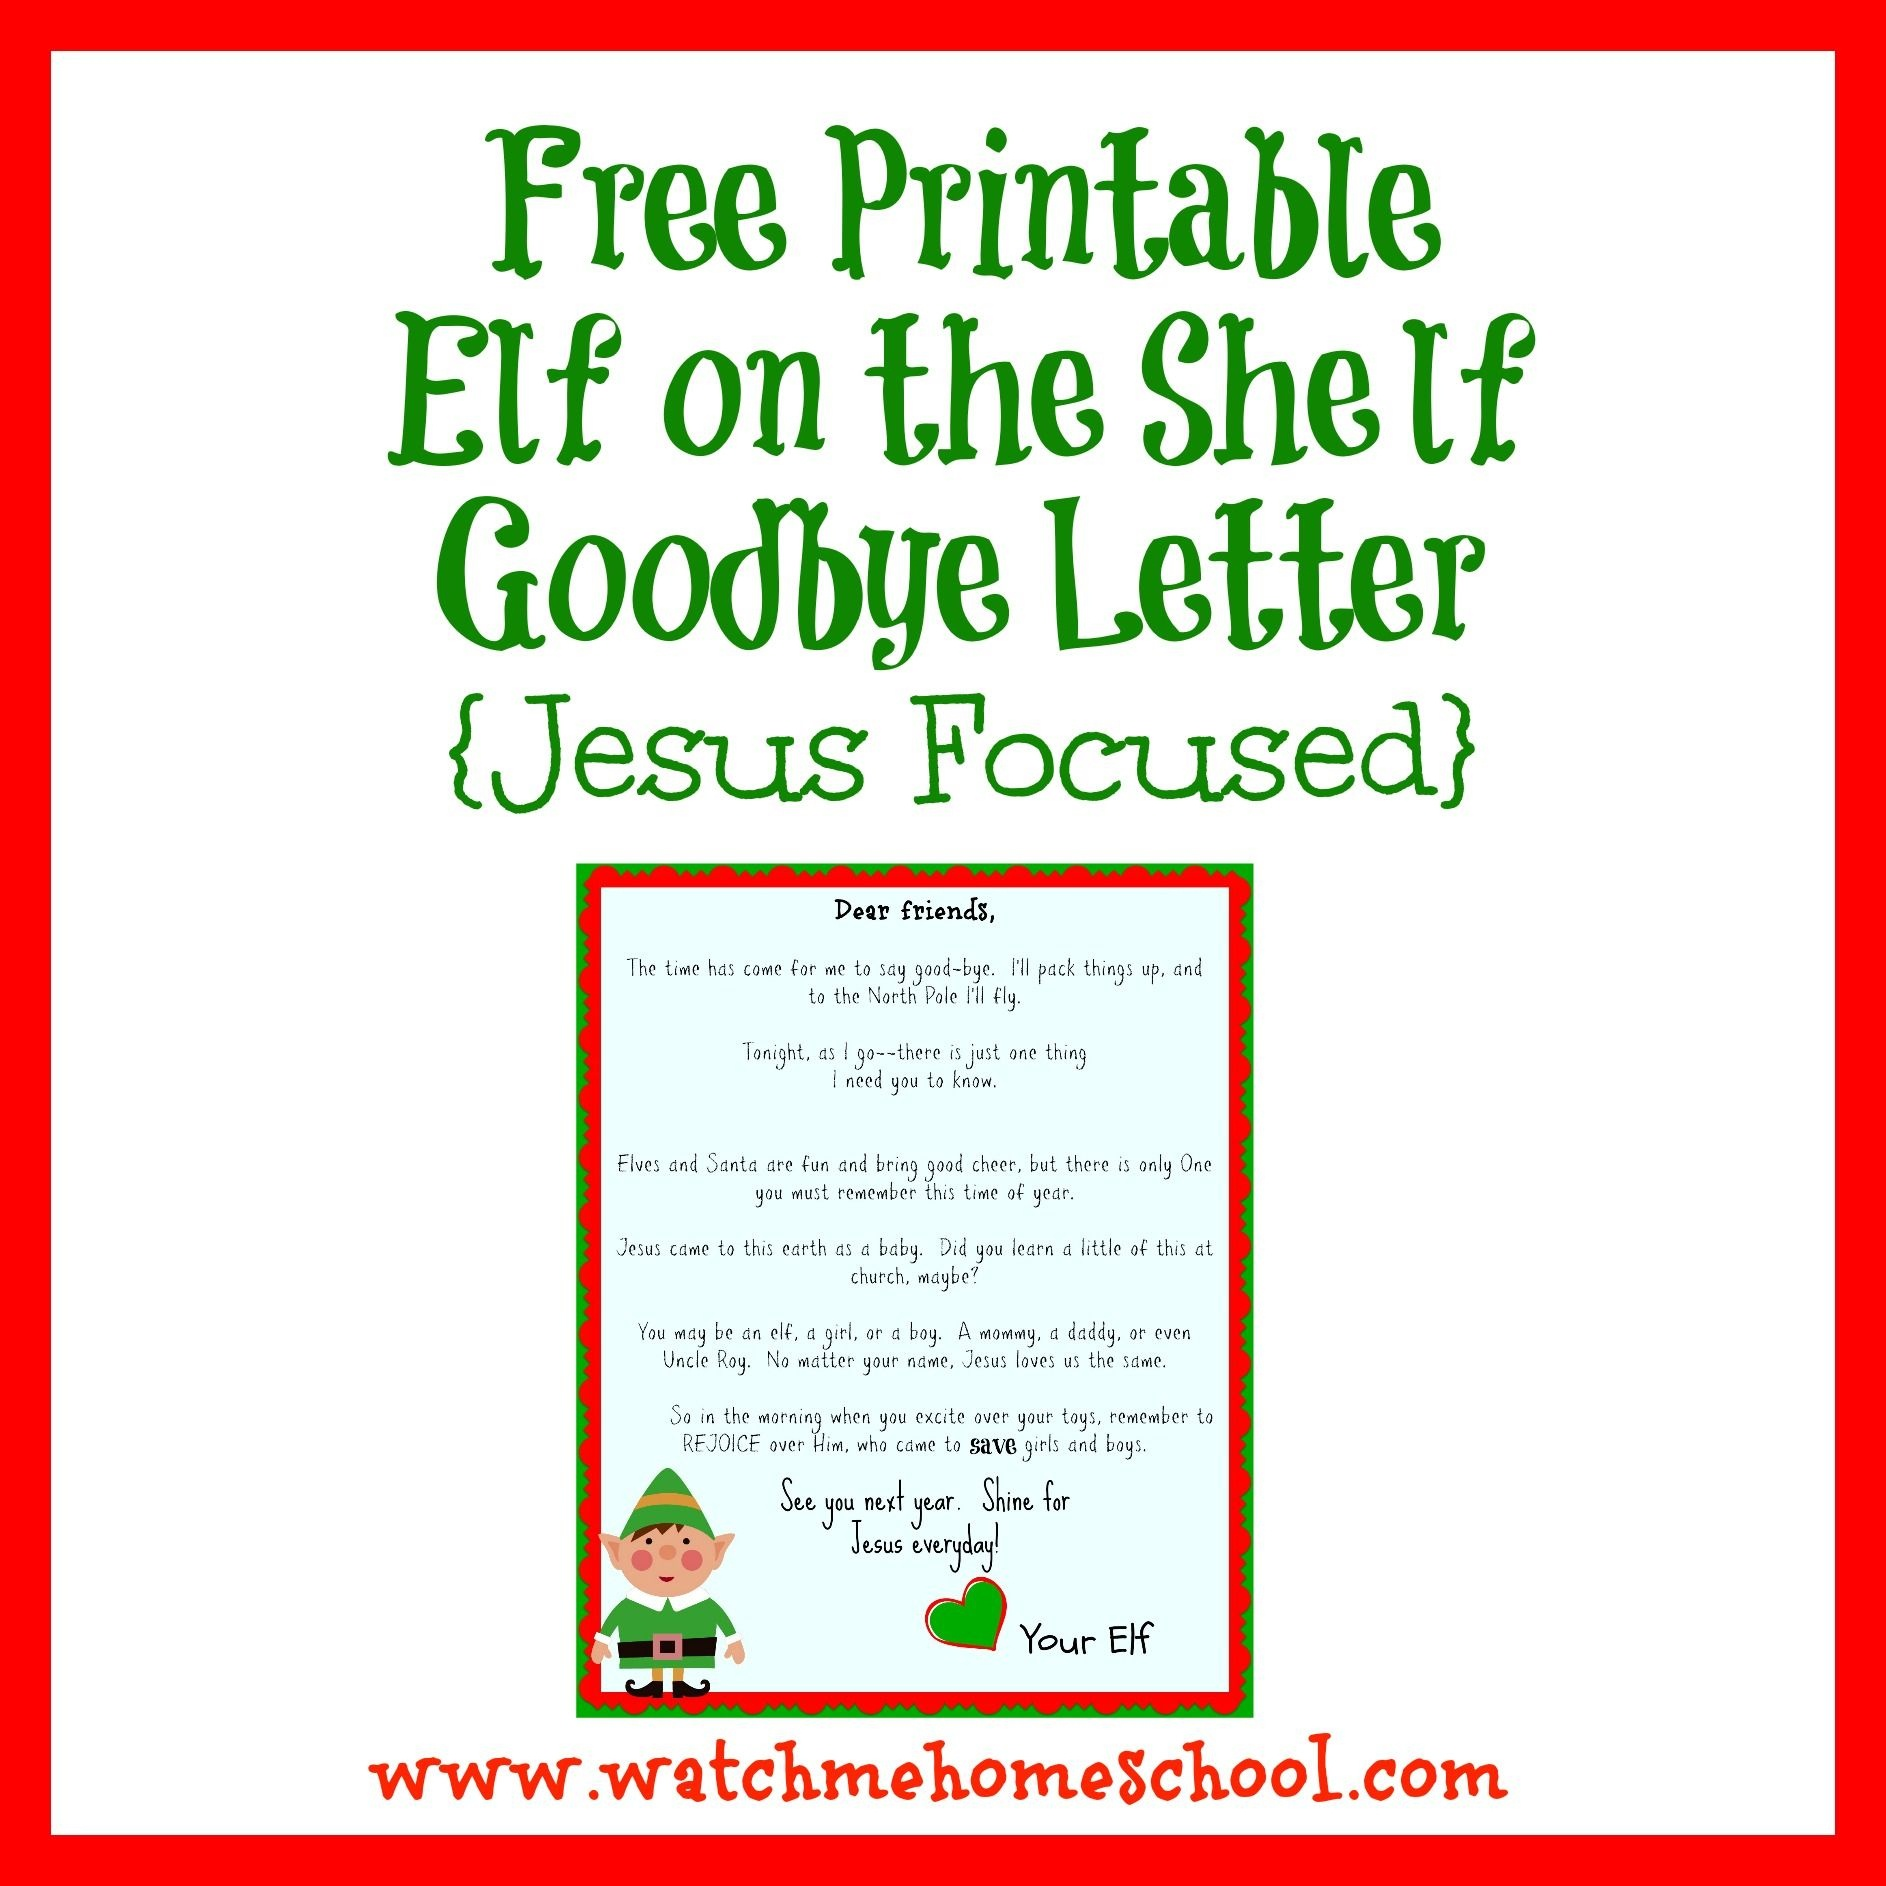 Elf On The Shelf Farewell Letter Printable   Elf On The Shelf   Elf - Goodbye Letter From Elf On The Shelf Free Printable